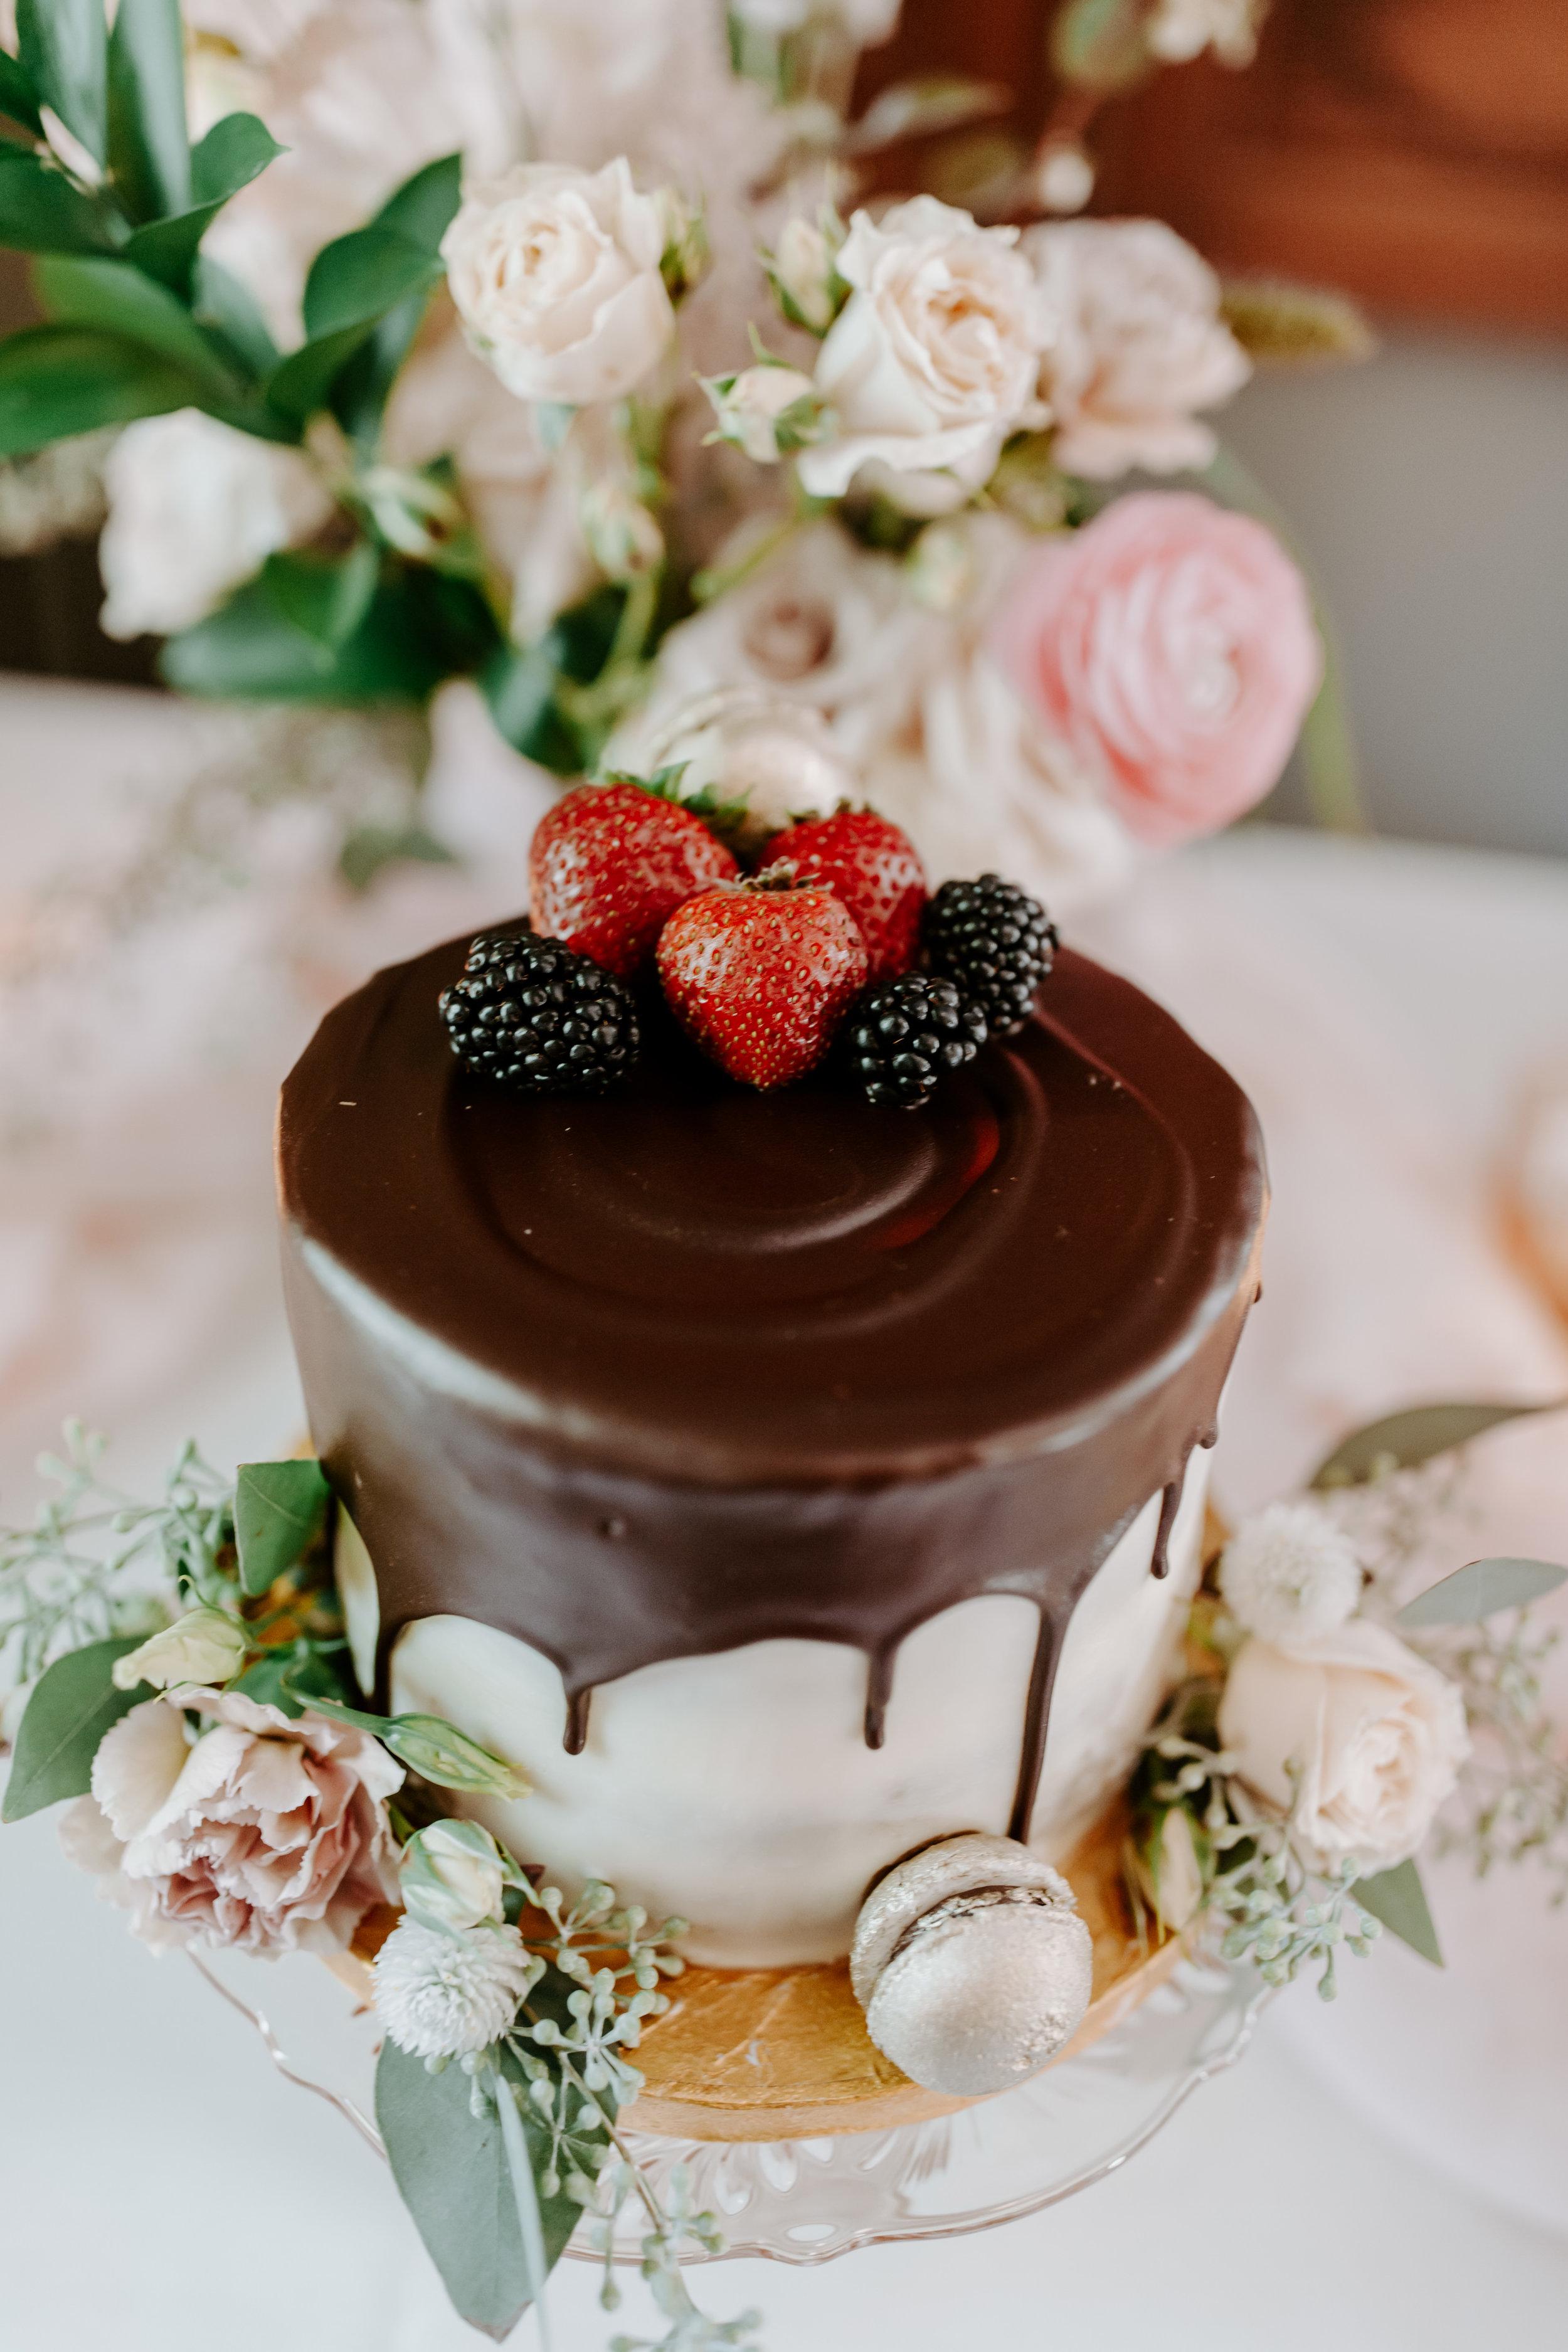 Rustic Bloom Photography | Wedding Cake Inspiration | Oregon Wedding Photographer